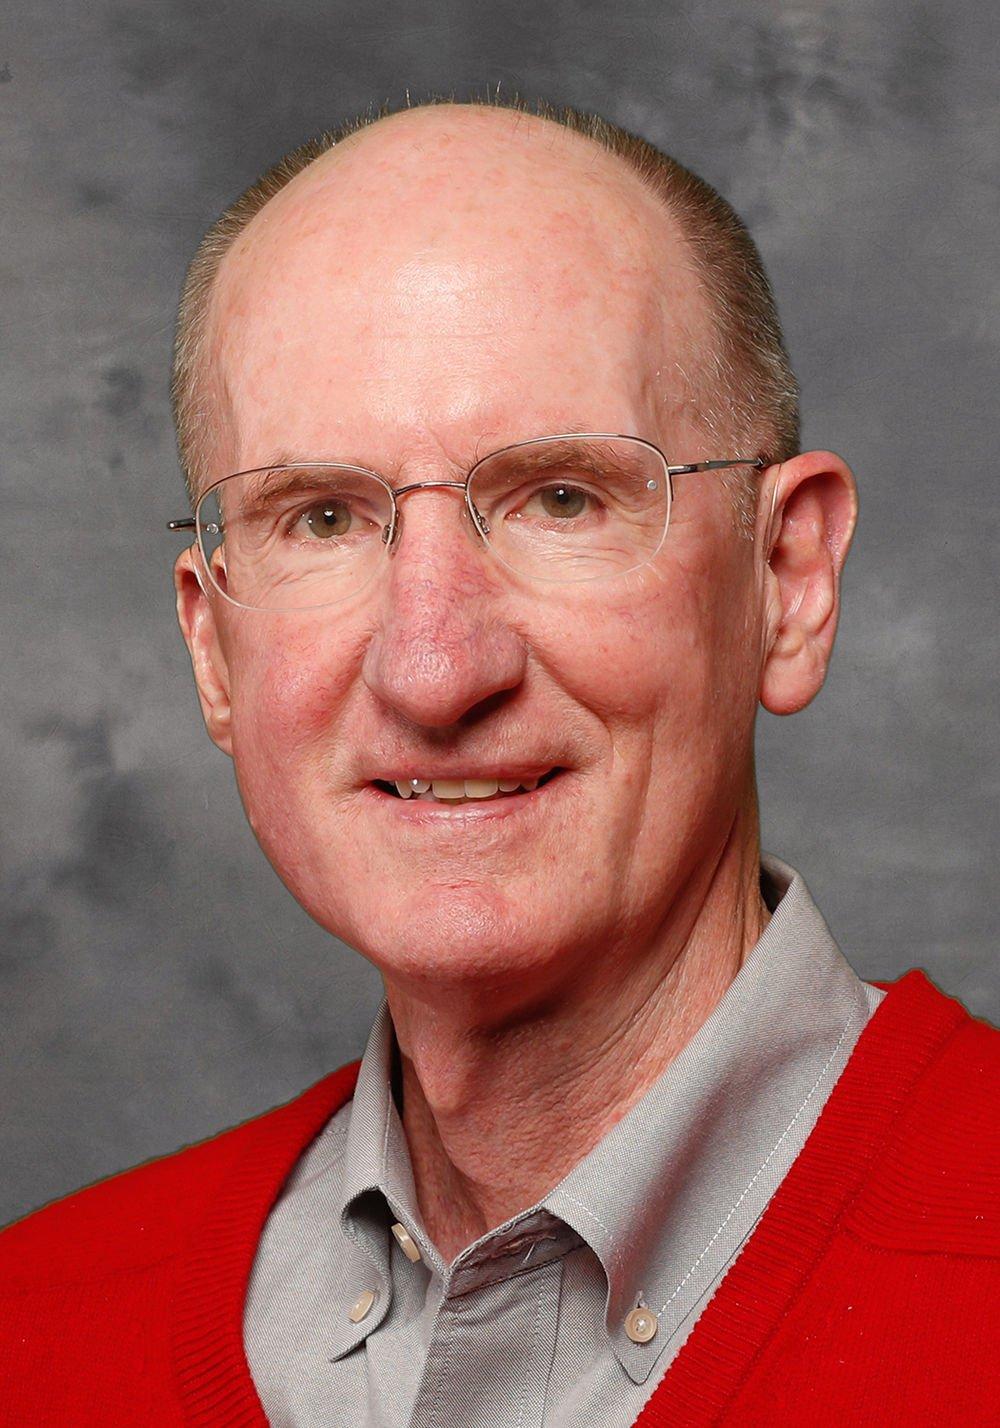 UNL PREC director Jack Whittier to retire